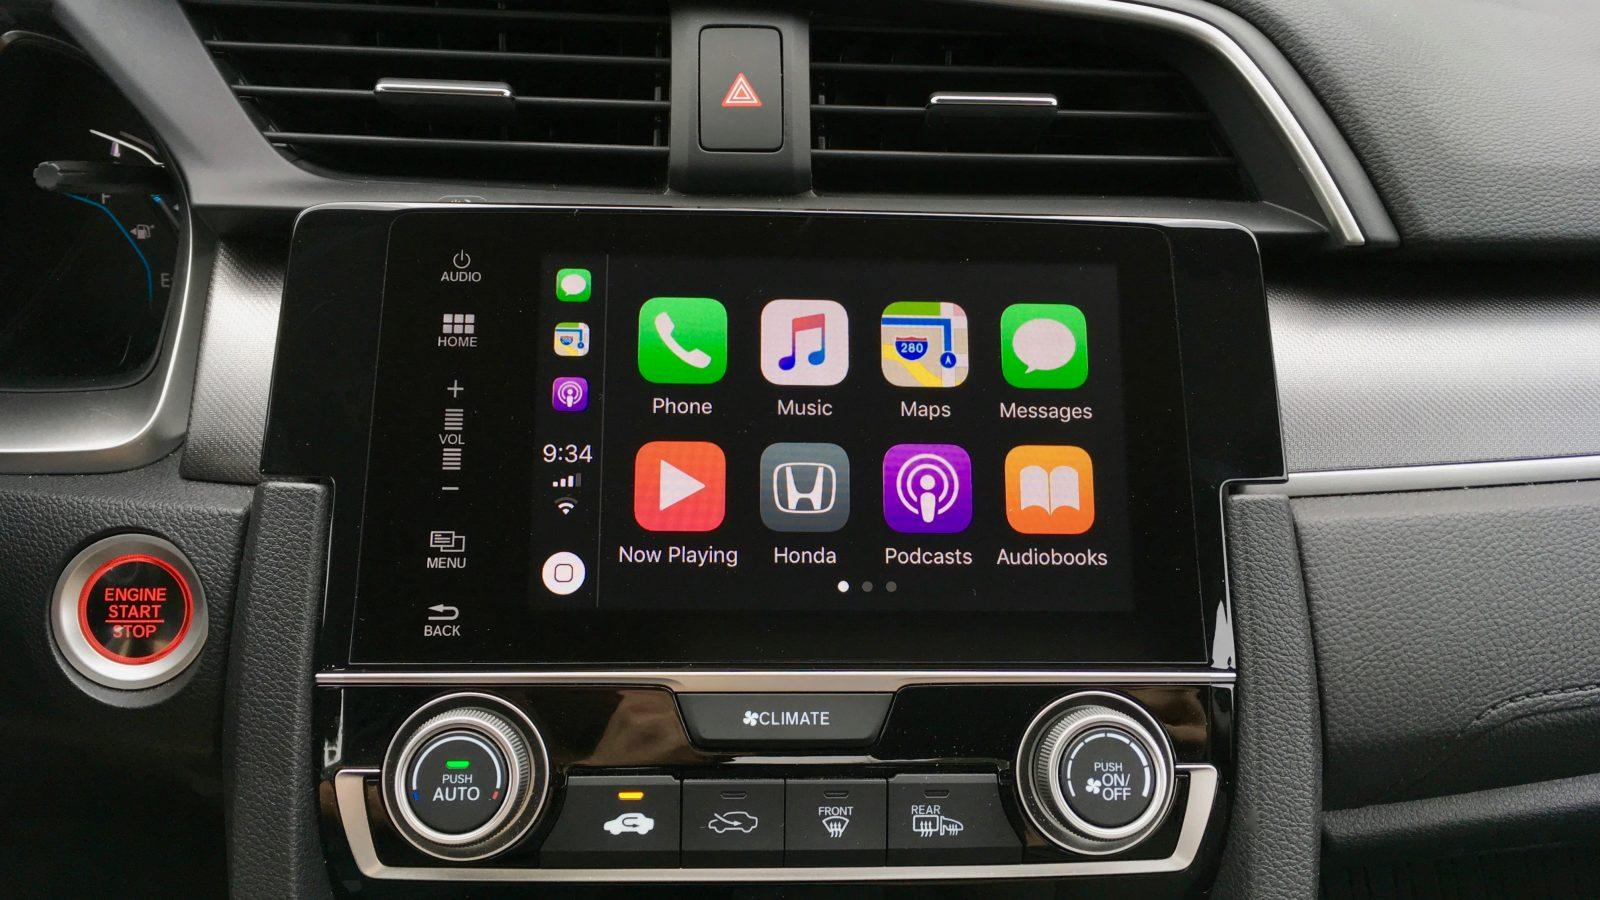 carplay in ios 11 lane guidance interface tweaks and. Black Bedroom Furniture Sets. Home Design Ideas